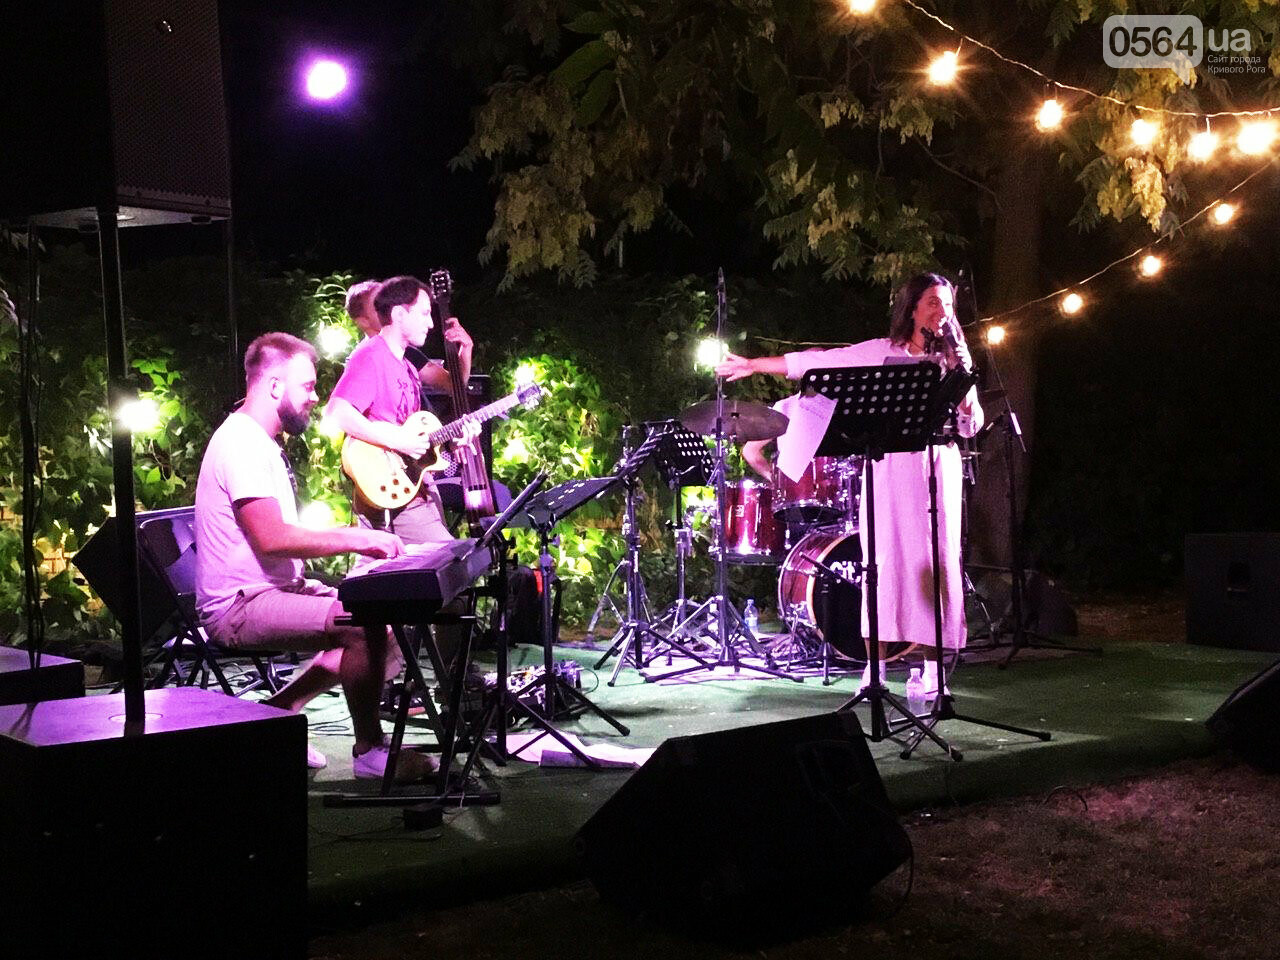 Под звездным небом криворожане наслаждались летним джазом от  Advantage Project, - ФОТО, ВИДЕО , фото-9